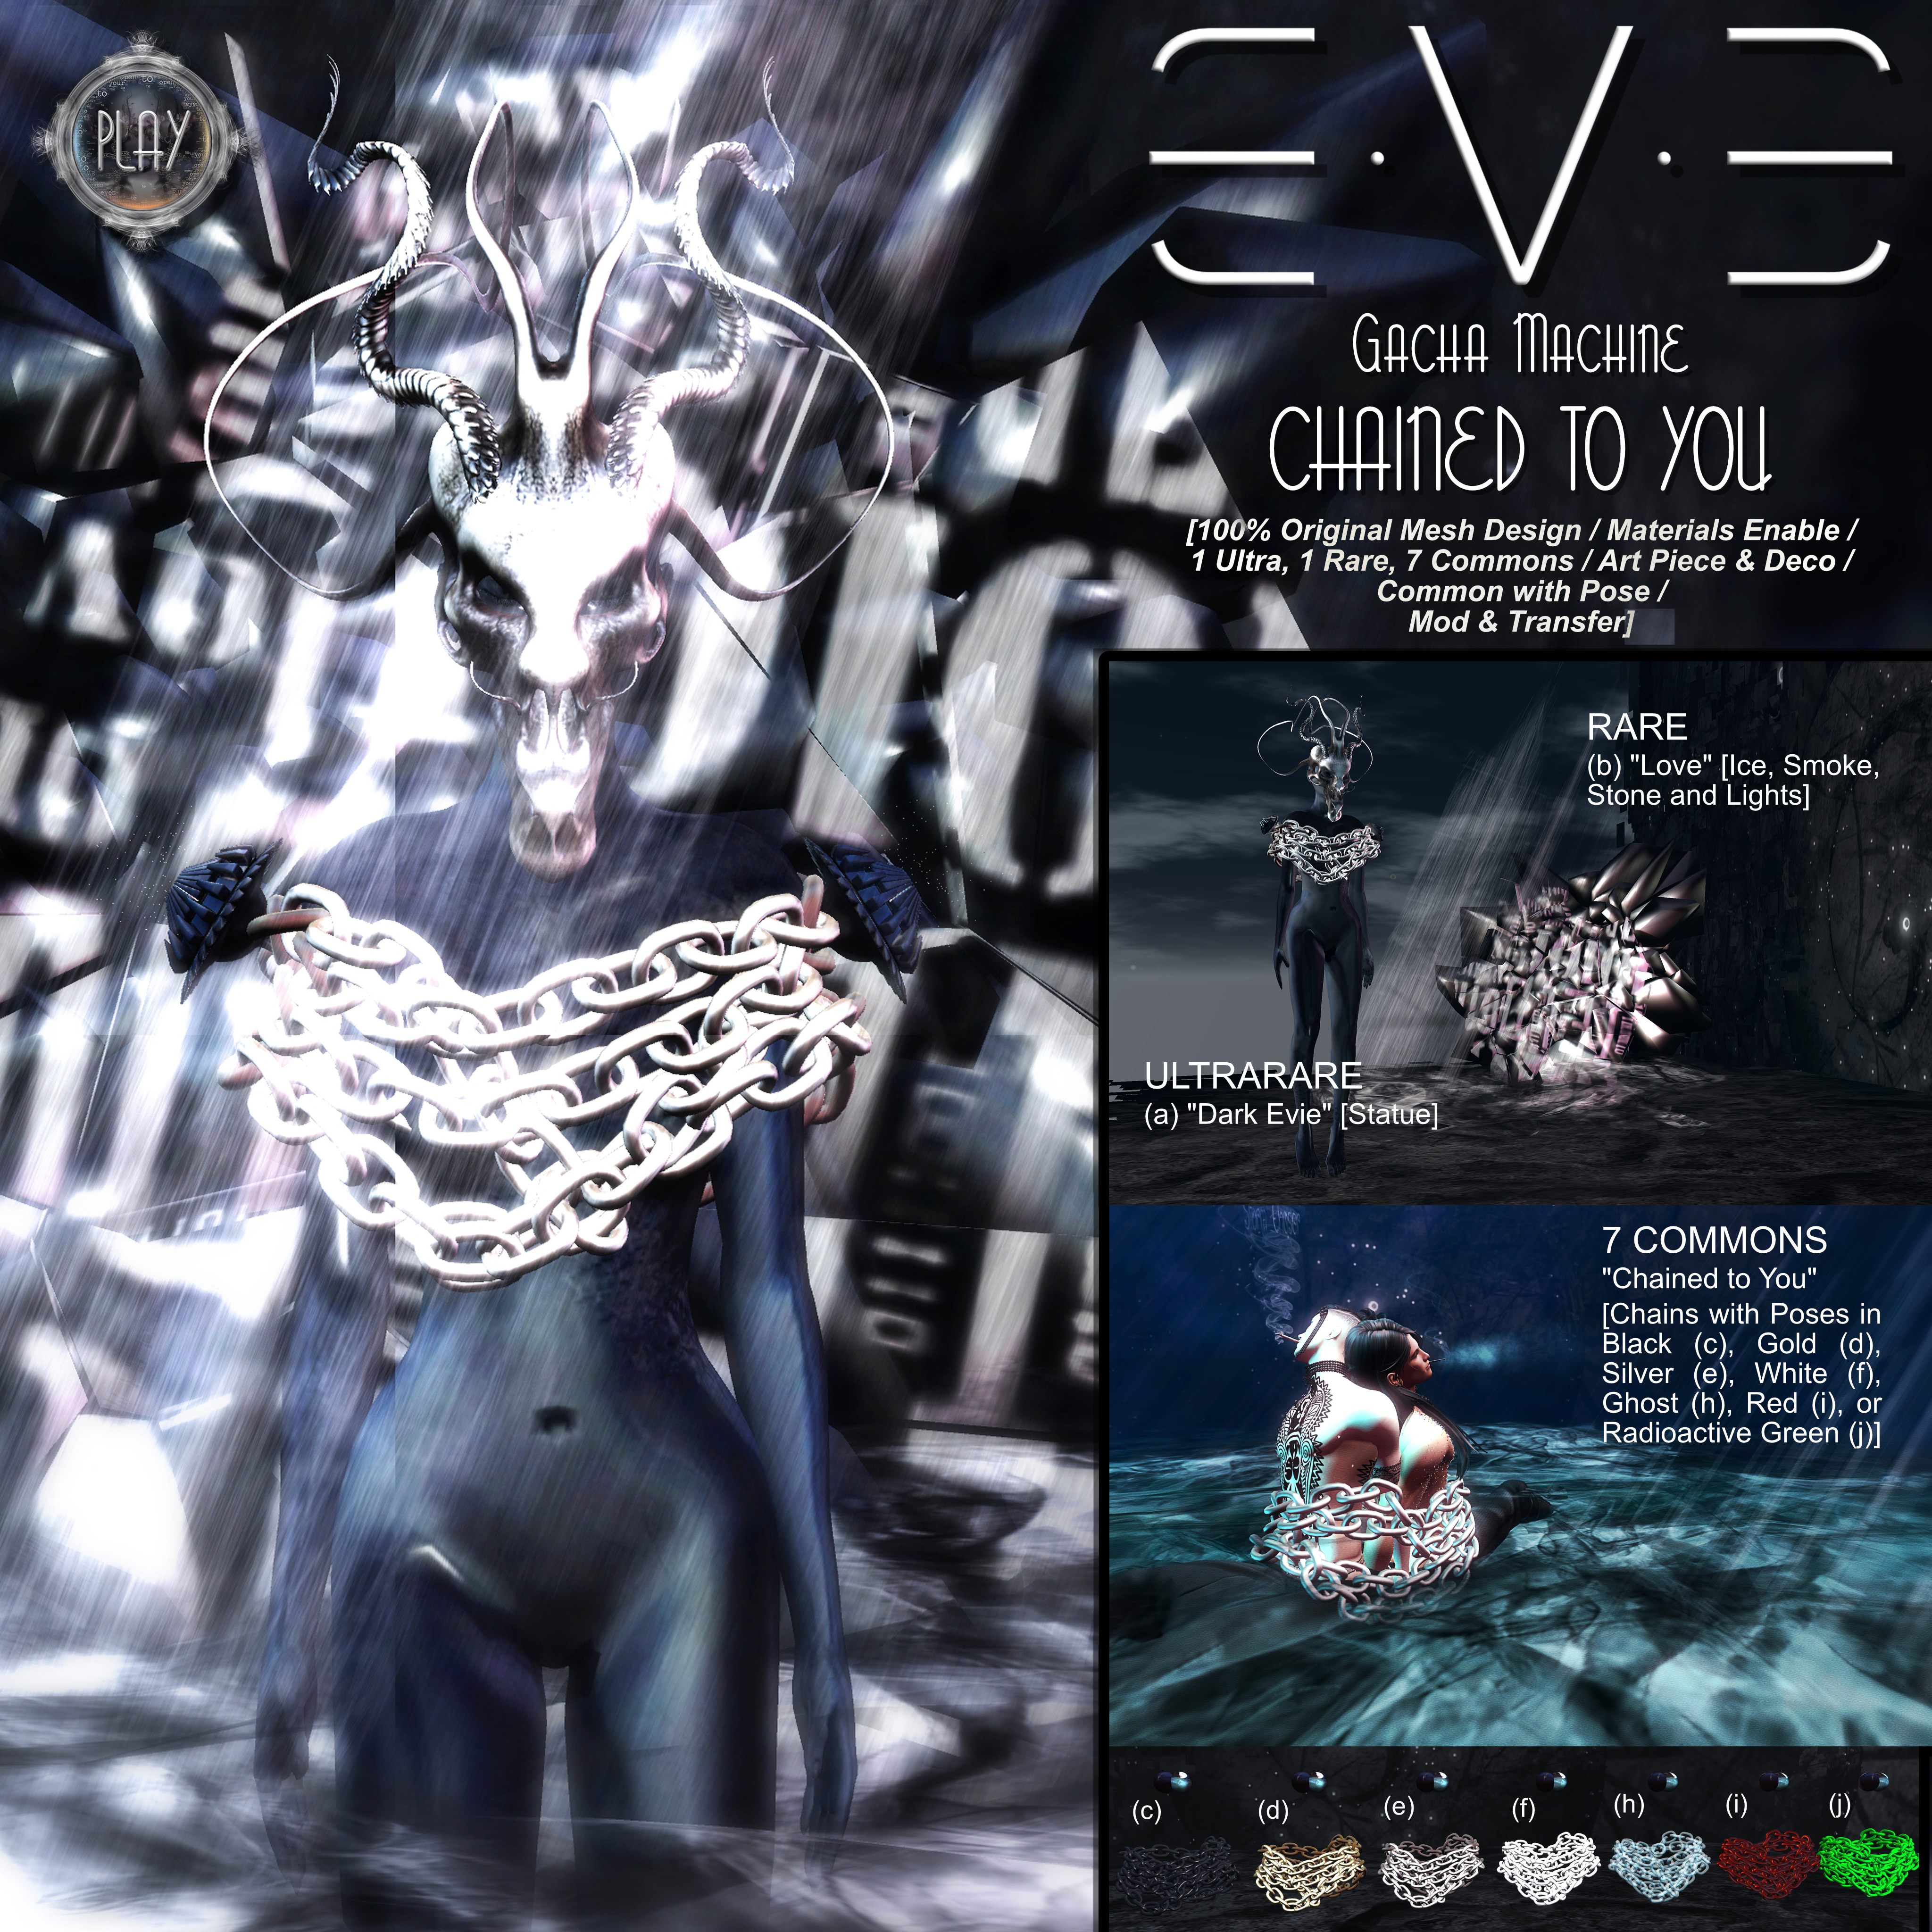 E.V.E Chained to You [info]